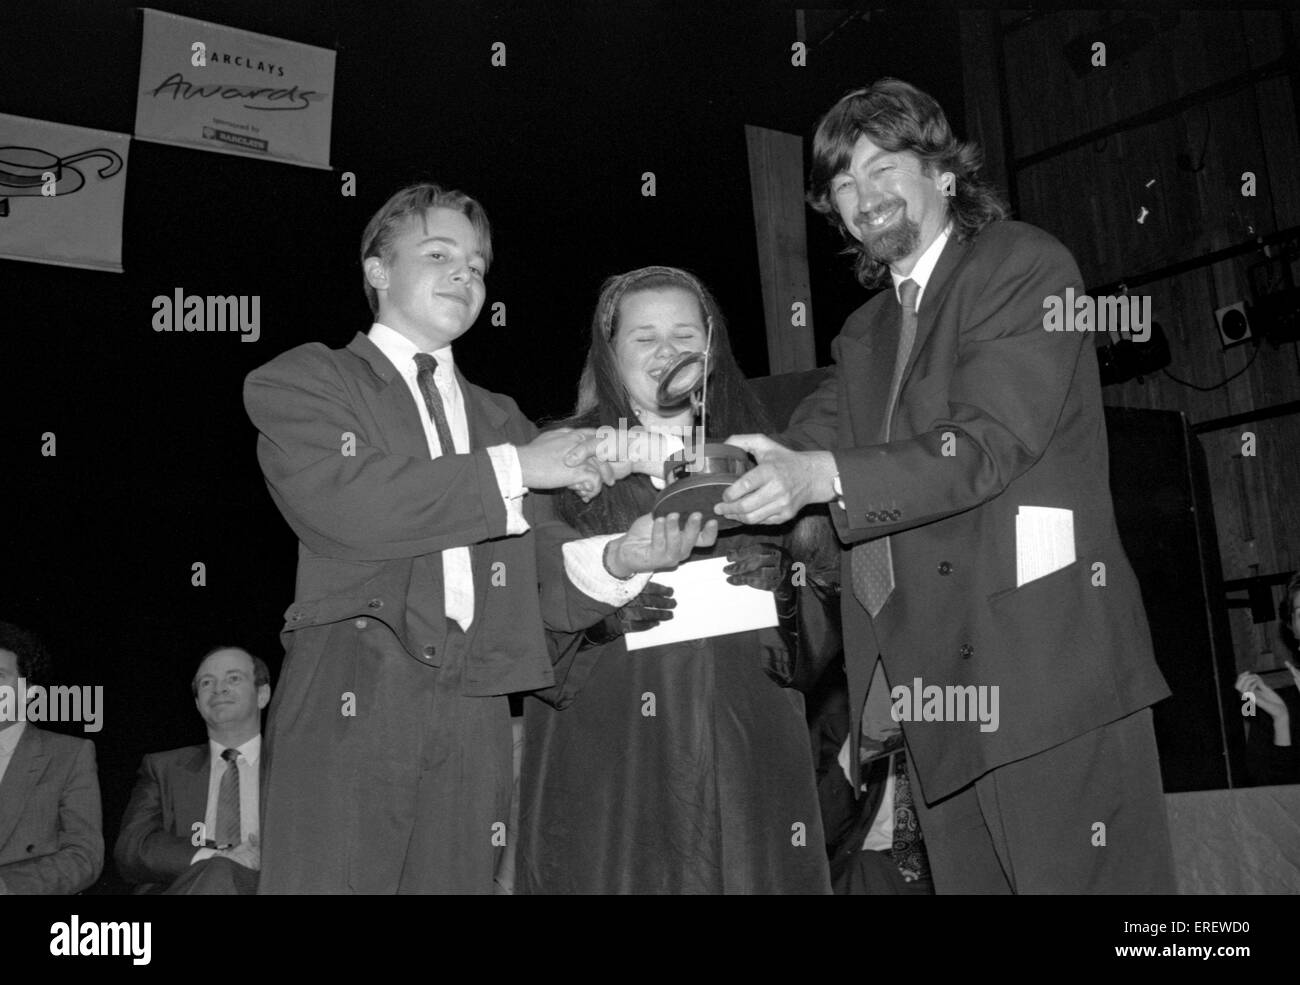 Sir Trevor Nunn CBE at the Barclays Children's Theatre Awards, Queen Elizabeth Hall, London,  1990. English - Stock Image